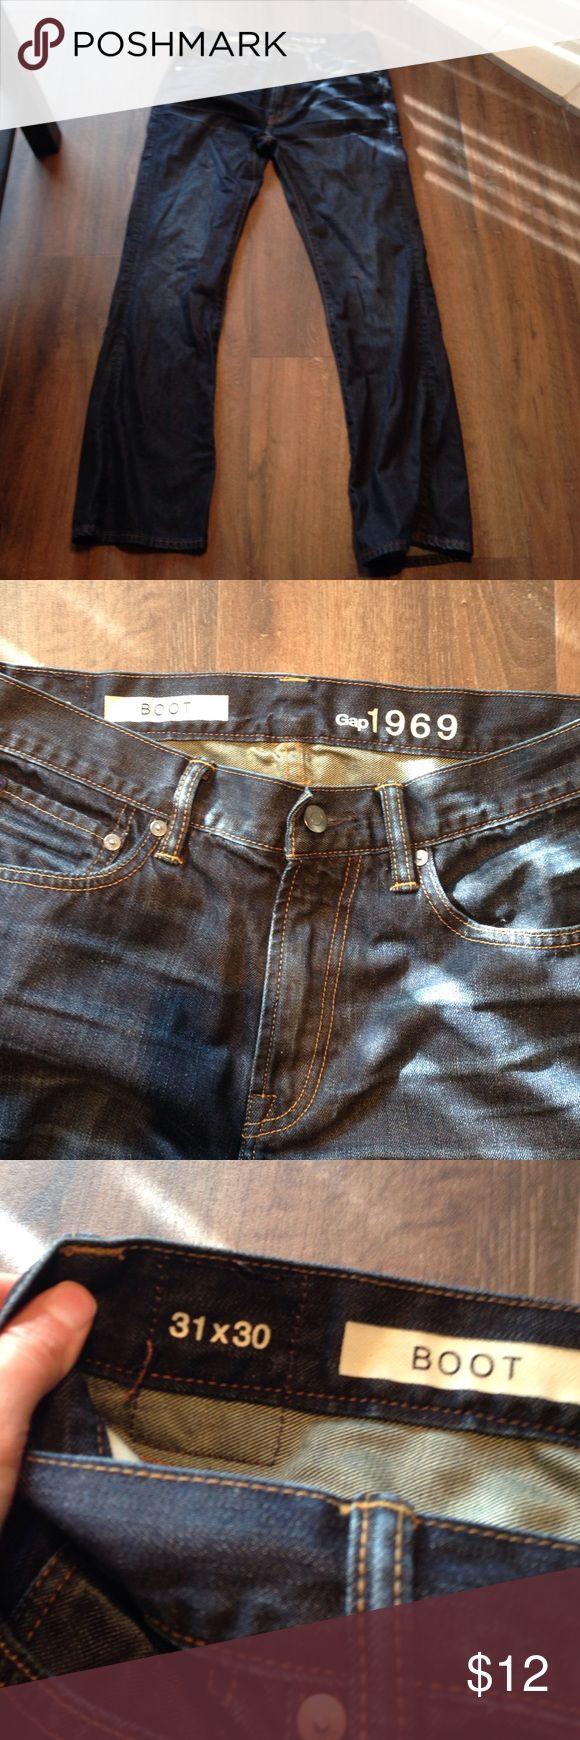 Men's Boot Cut Gap Jeans 31x30 Mens Gap boot cut jeans 100% cotton. Waist 31 length 30 GAP Jeans Bootcut